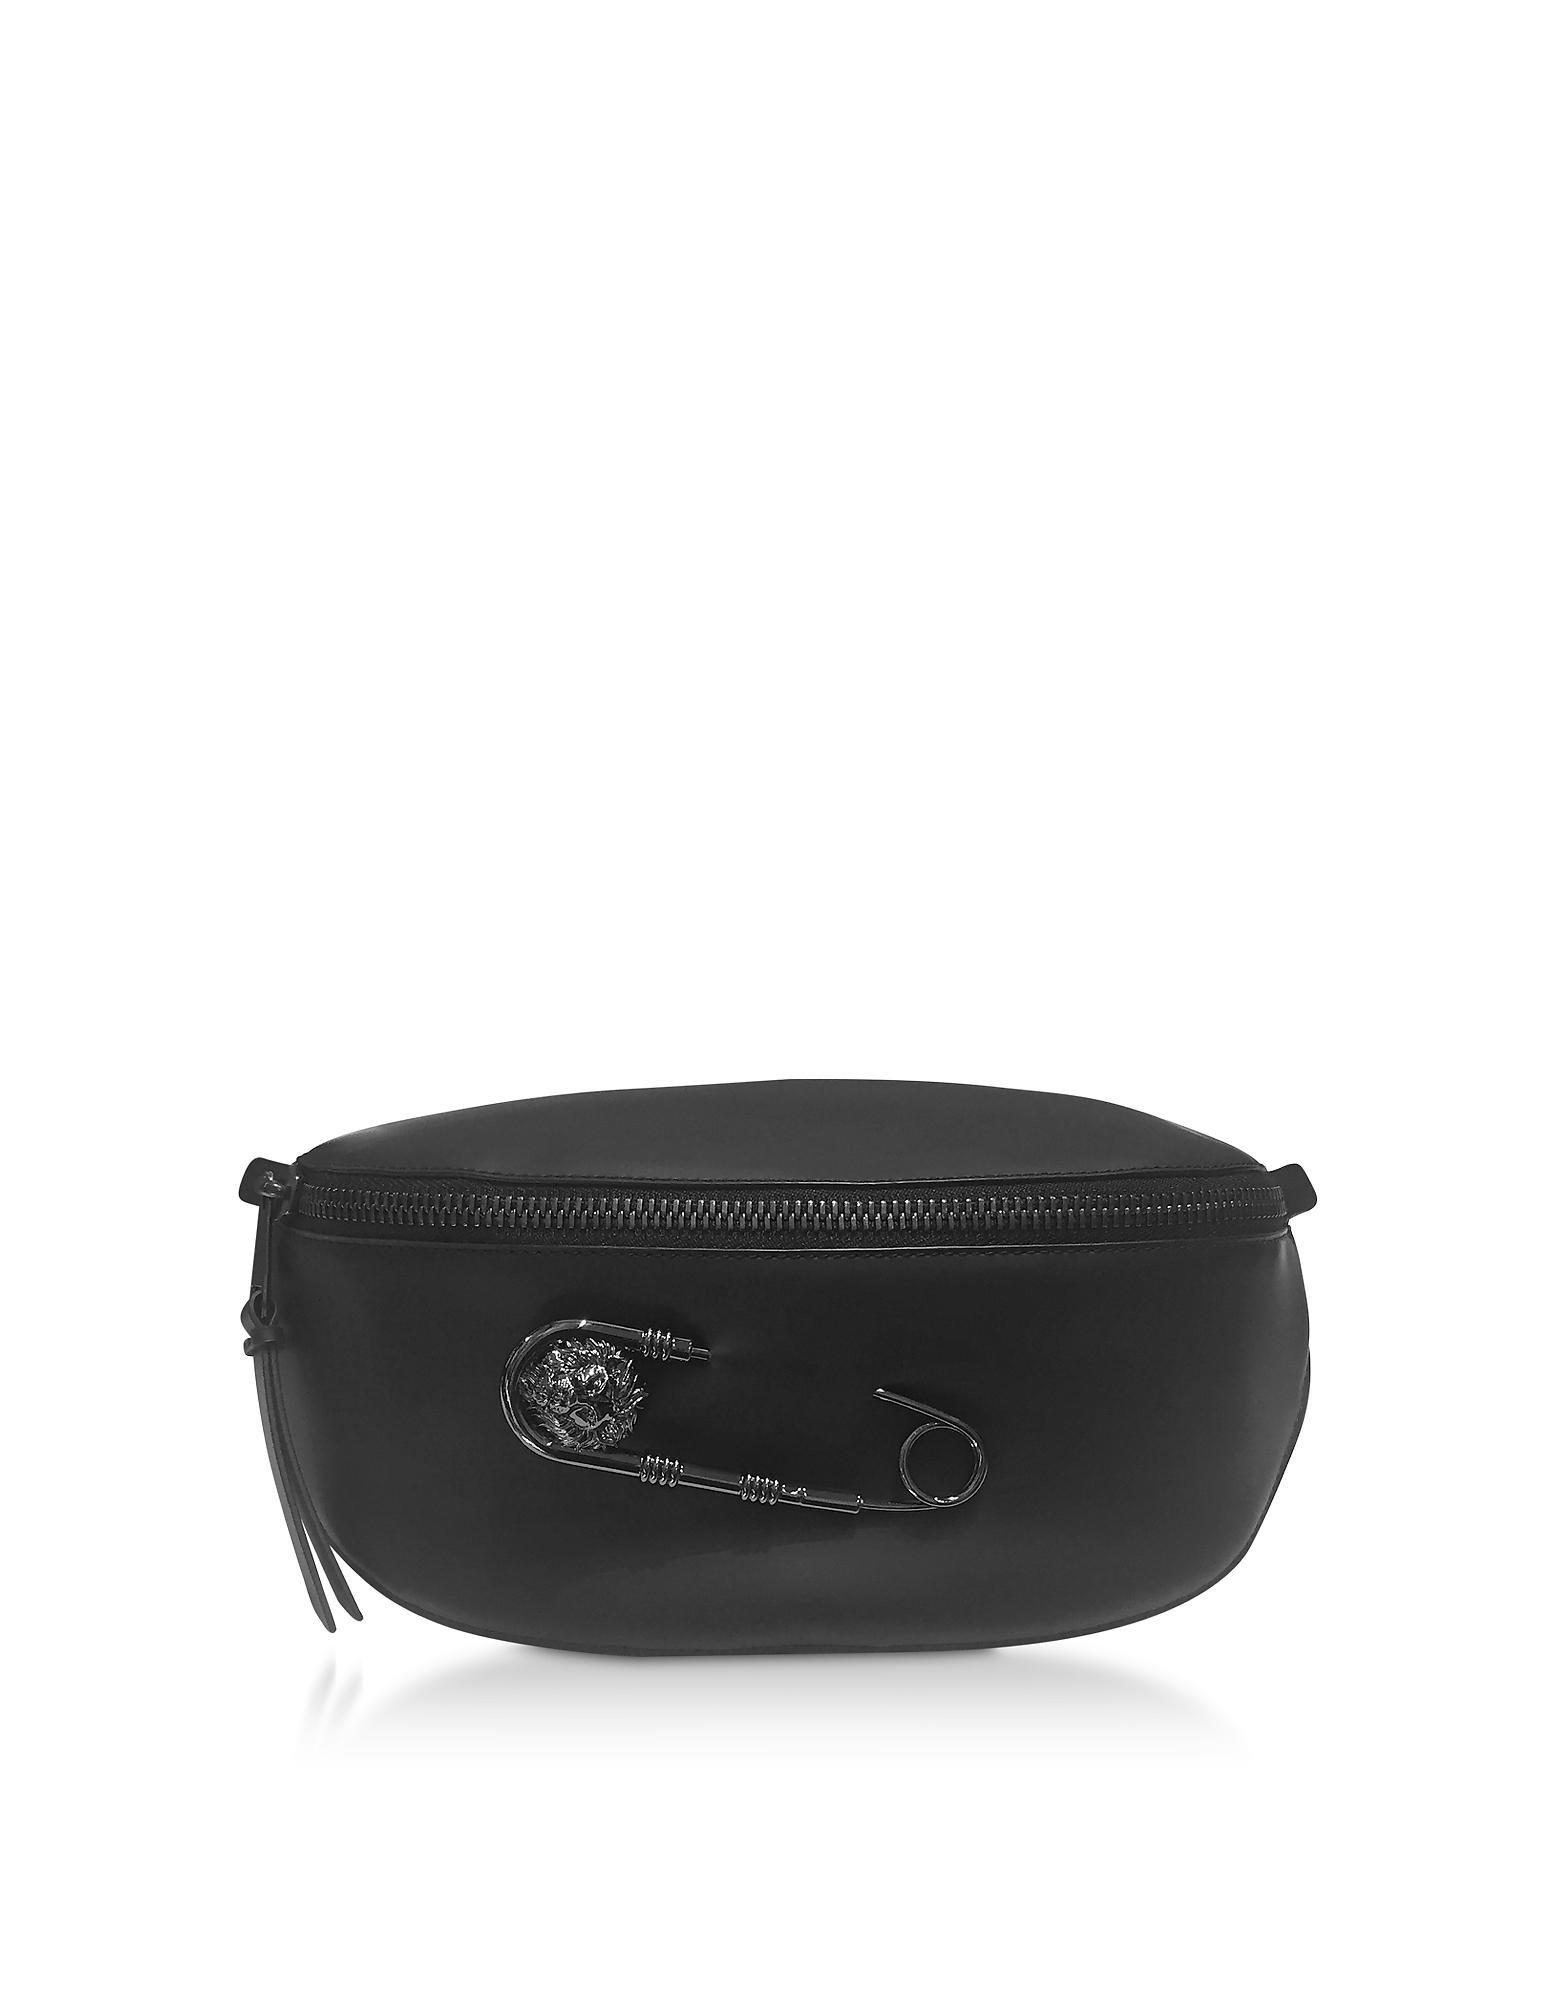 04276c82b6f8 Lyst - Versus Black Gummy Calf Leather Belt Bag in Black